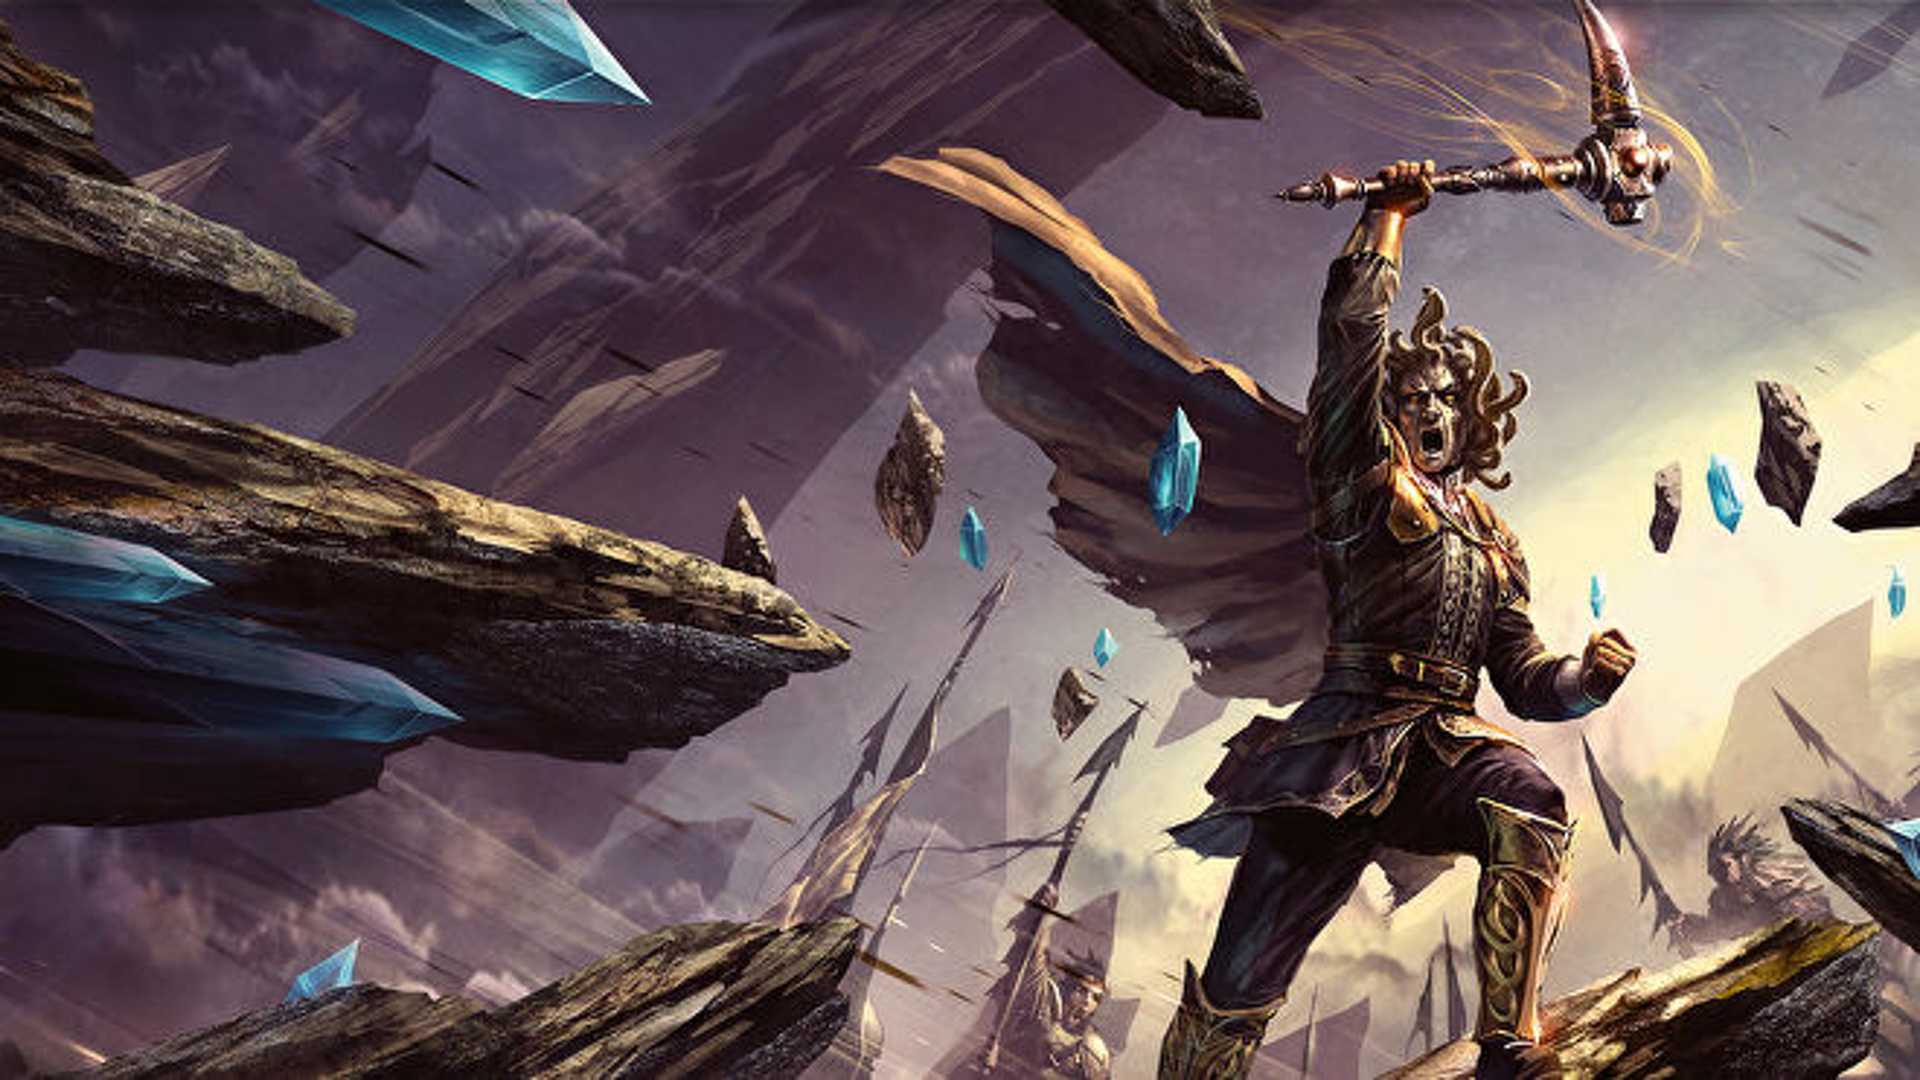 Dungeons & Dragons roleplaying game artwork 23